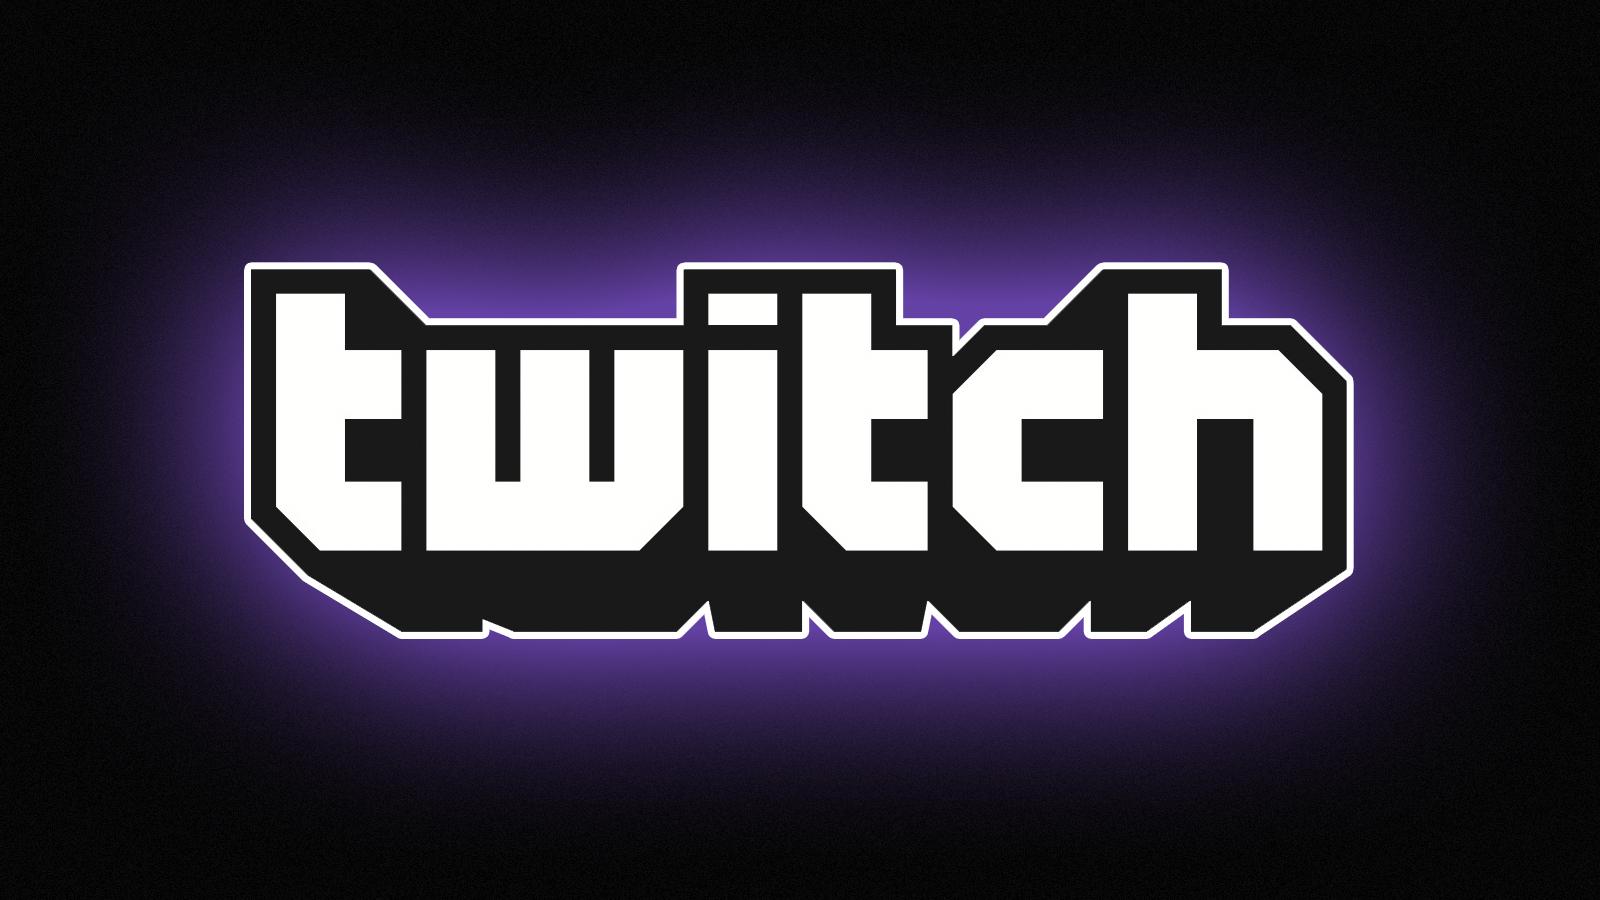 Twitch stream: Kit nézzünk 2015-ben?